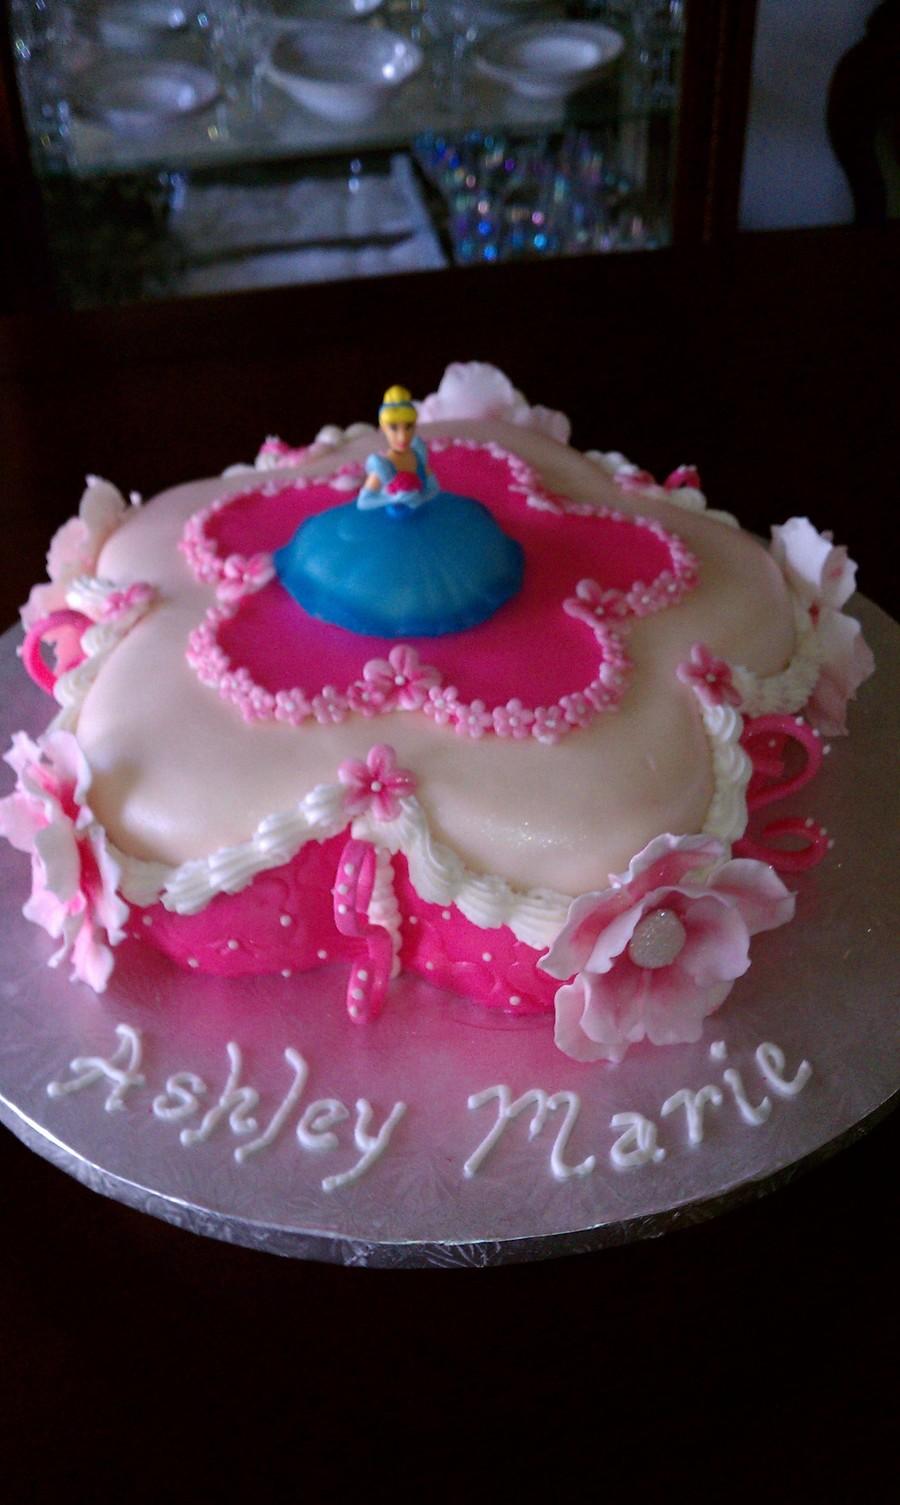 Groovy Girly Cake Cakecentral Com Personalised Birthday Cards Arneslily Jamesorg